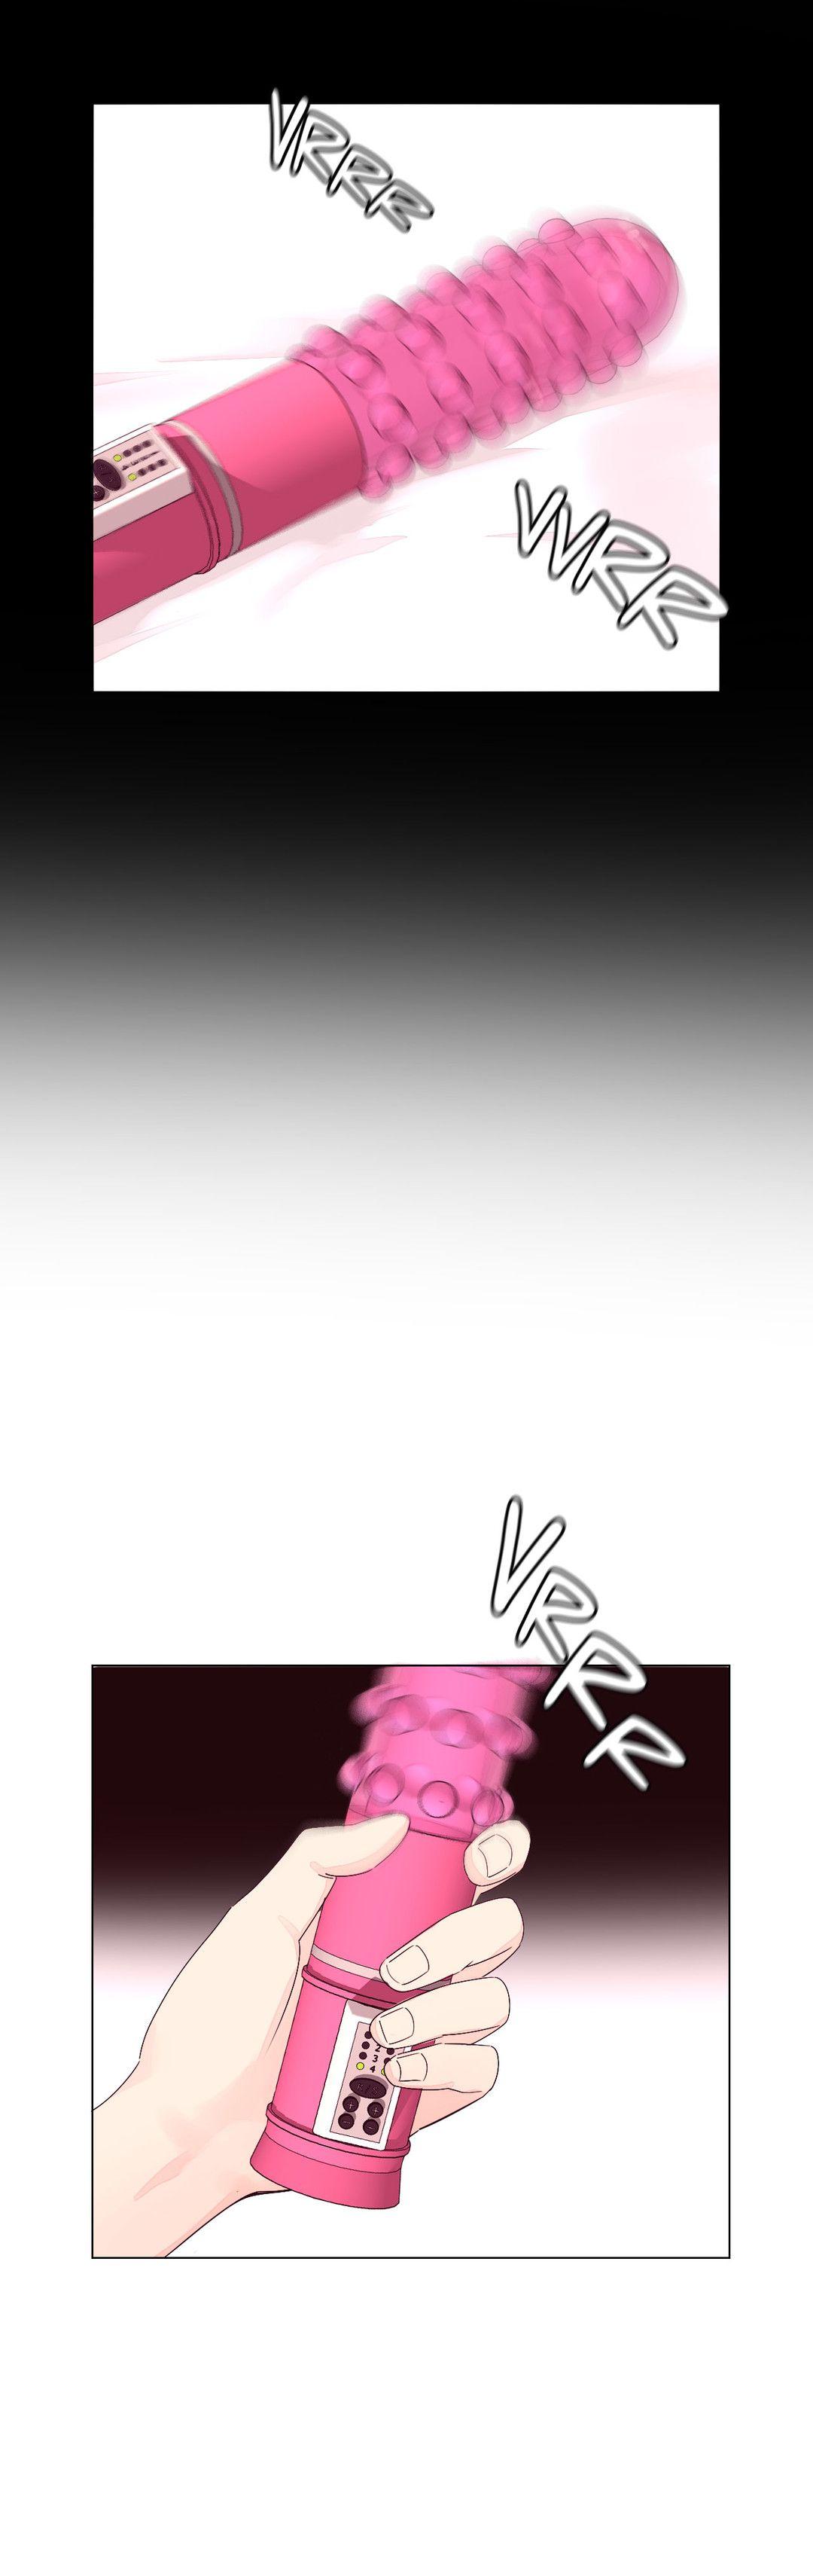 https://c9.mangatag.com/es_manga/pic5/58/25146/644430/2eb99d7a3cf8292194ab0a56541f0d24.jpg Page 8